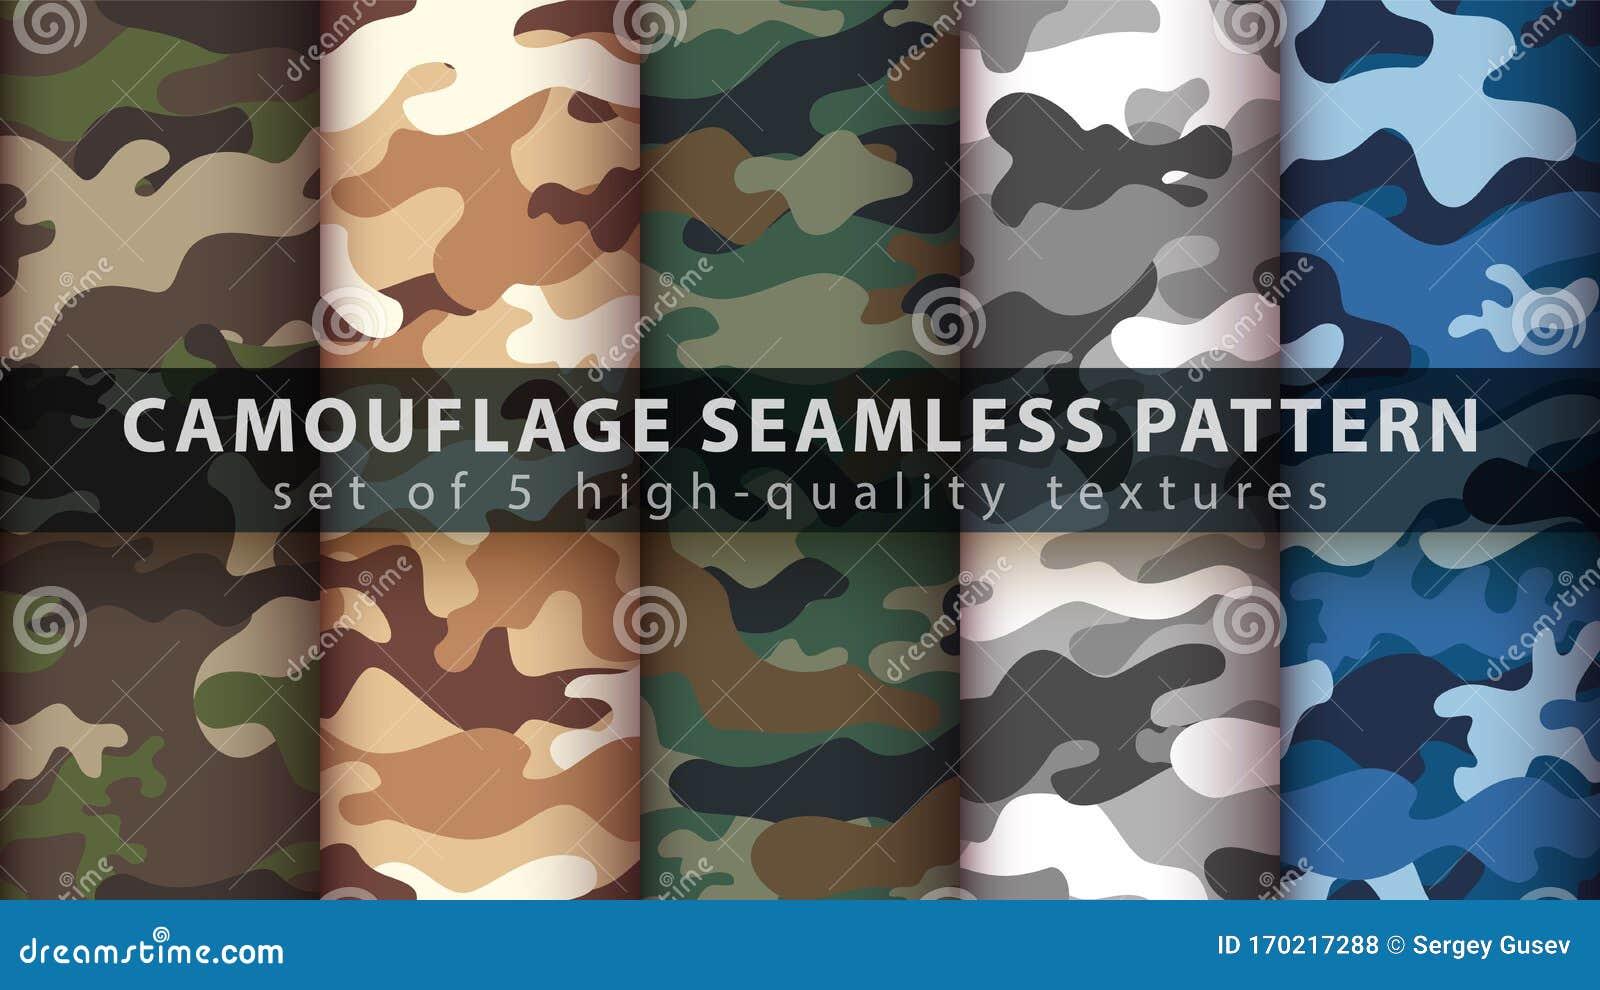 Camouflage Pattern Stock Illustrations 53 157 Camouflage Pattern Stock Illustrations Vectors Clipart Dreamstime